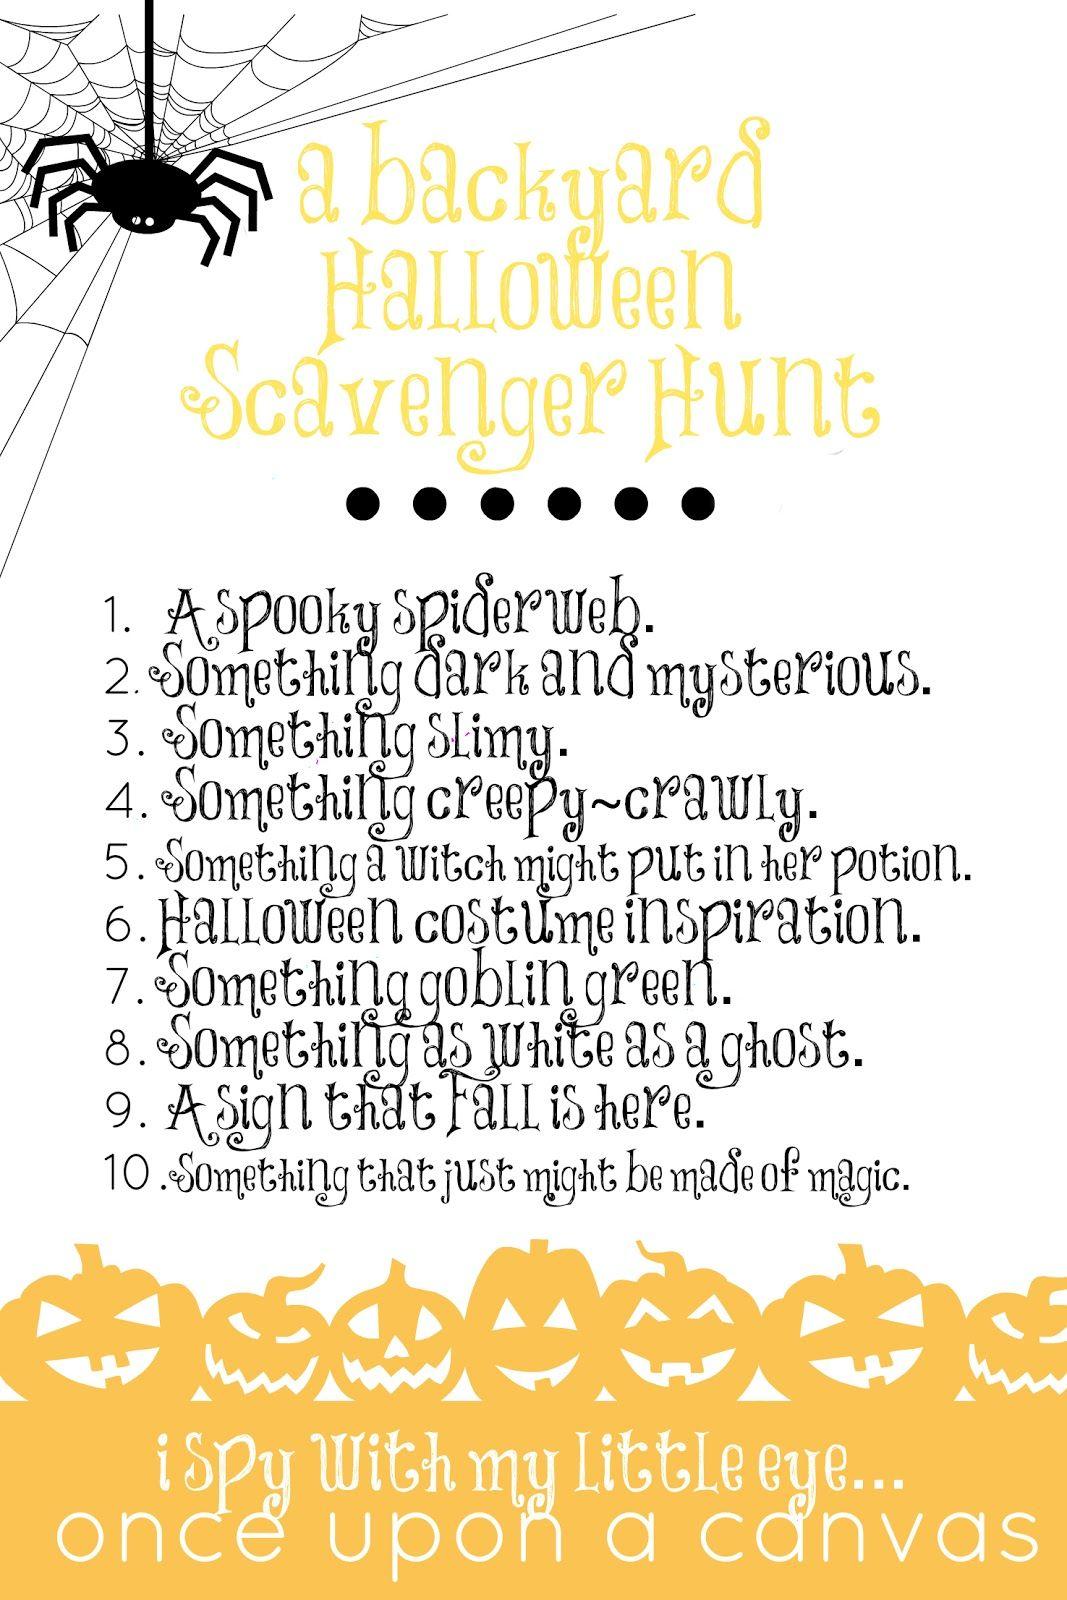 I Spy A Halloween Nature Scavenger Hunt